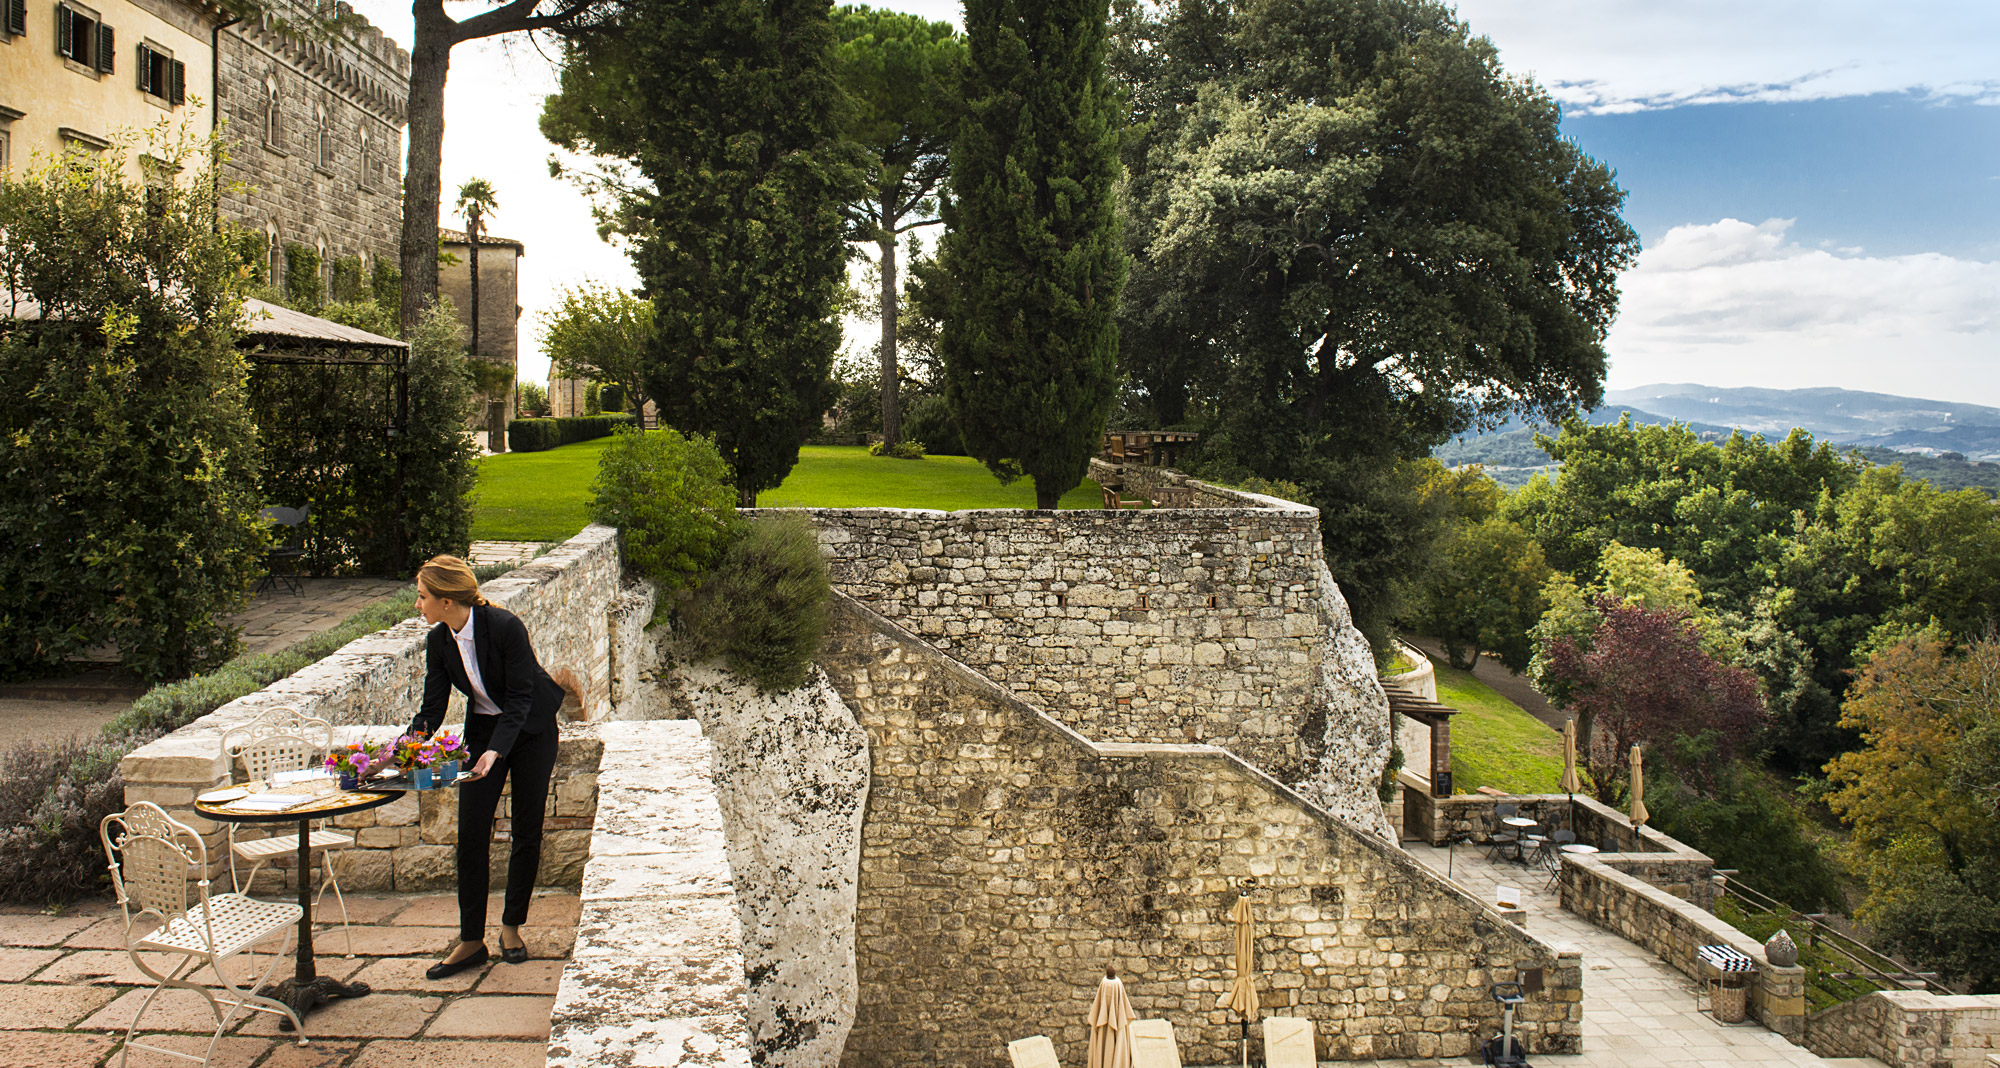 Borgo Pignano, the Tuscan fantasy come true